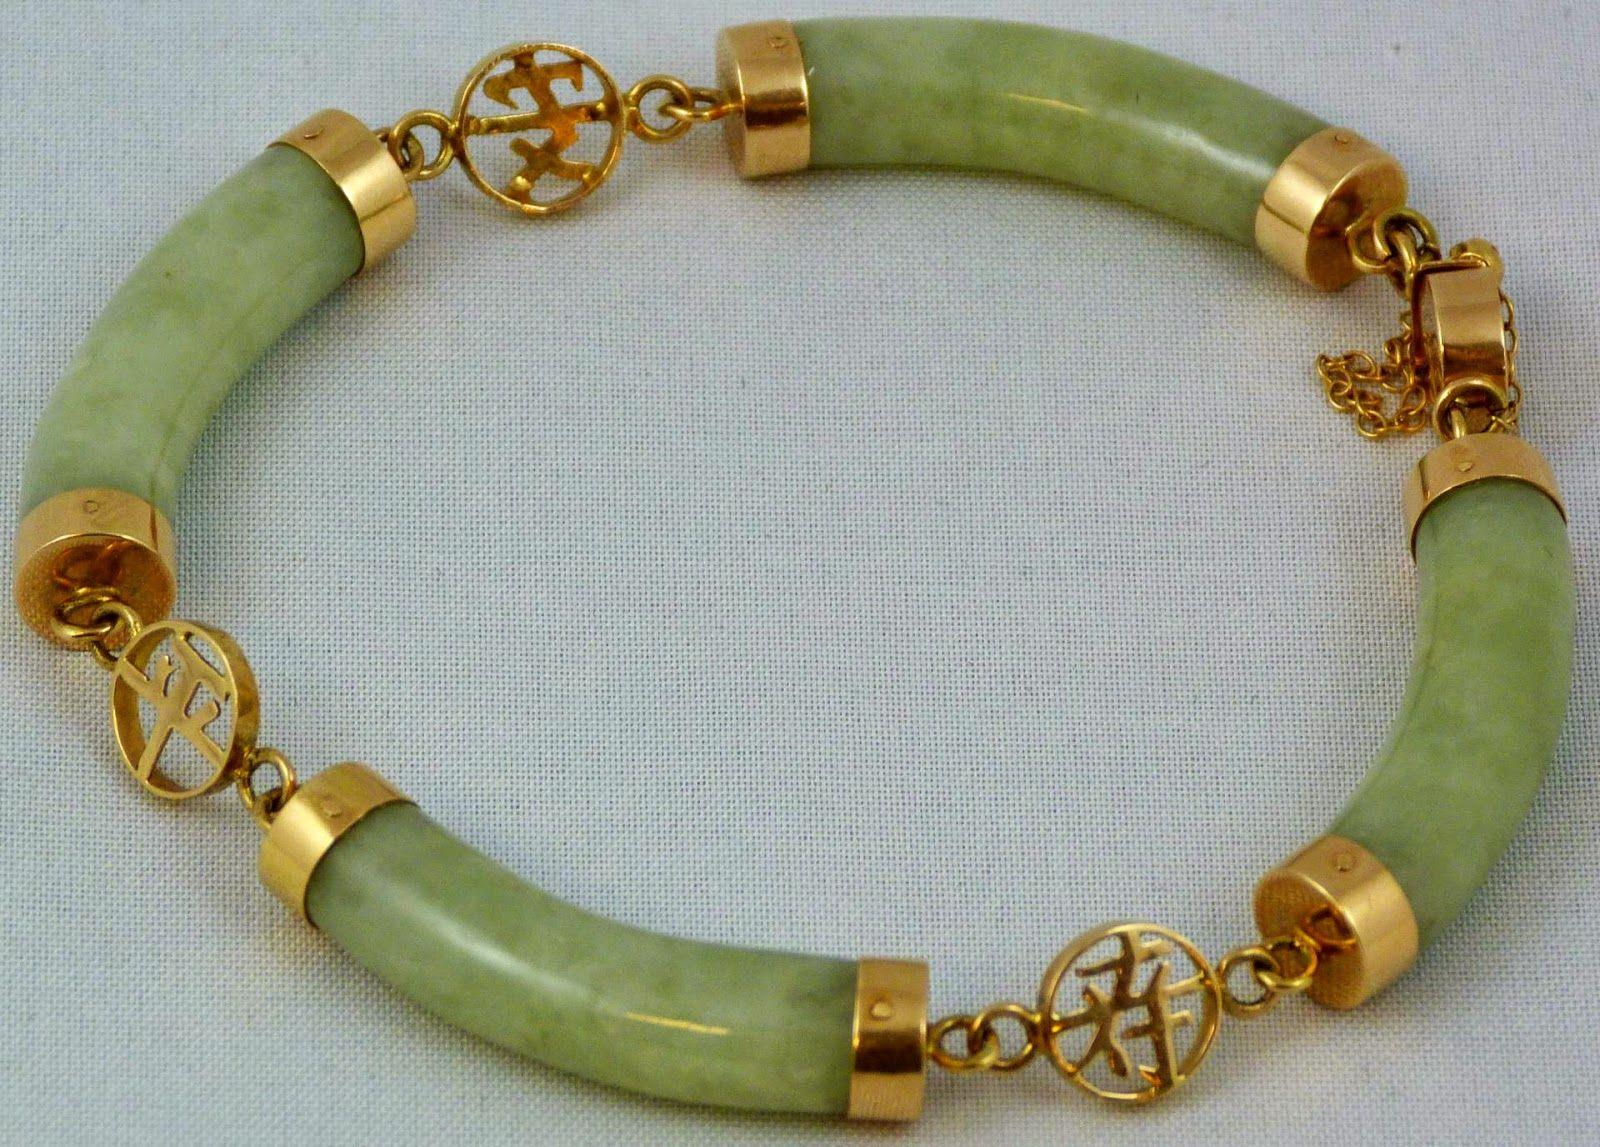 Jade bangle repair idea google search jadeite nephrite jade bracelet set in yellow gold with chinese symbol separators buycottarizona